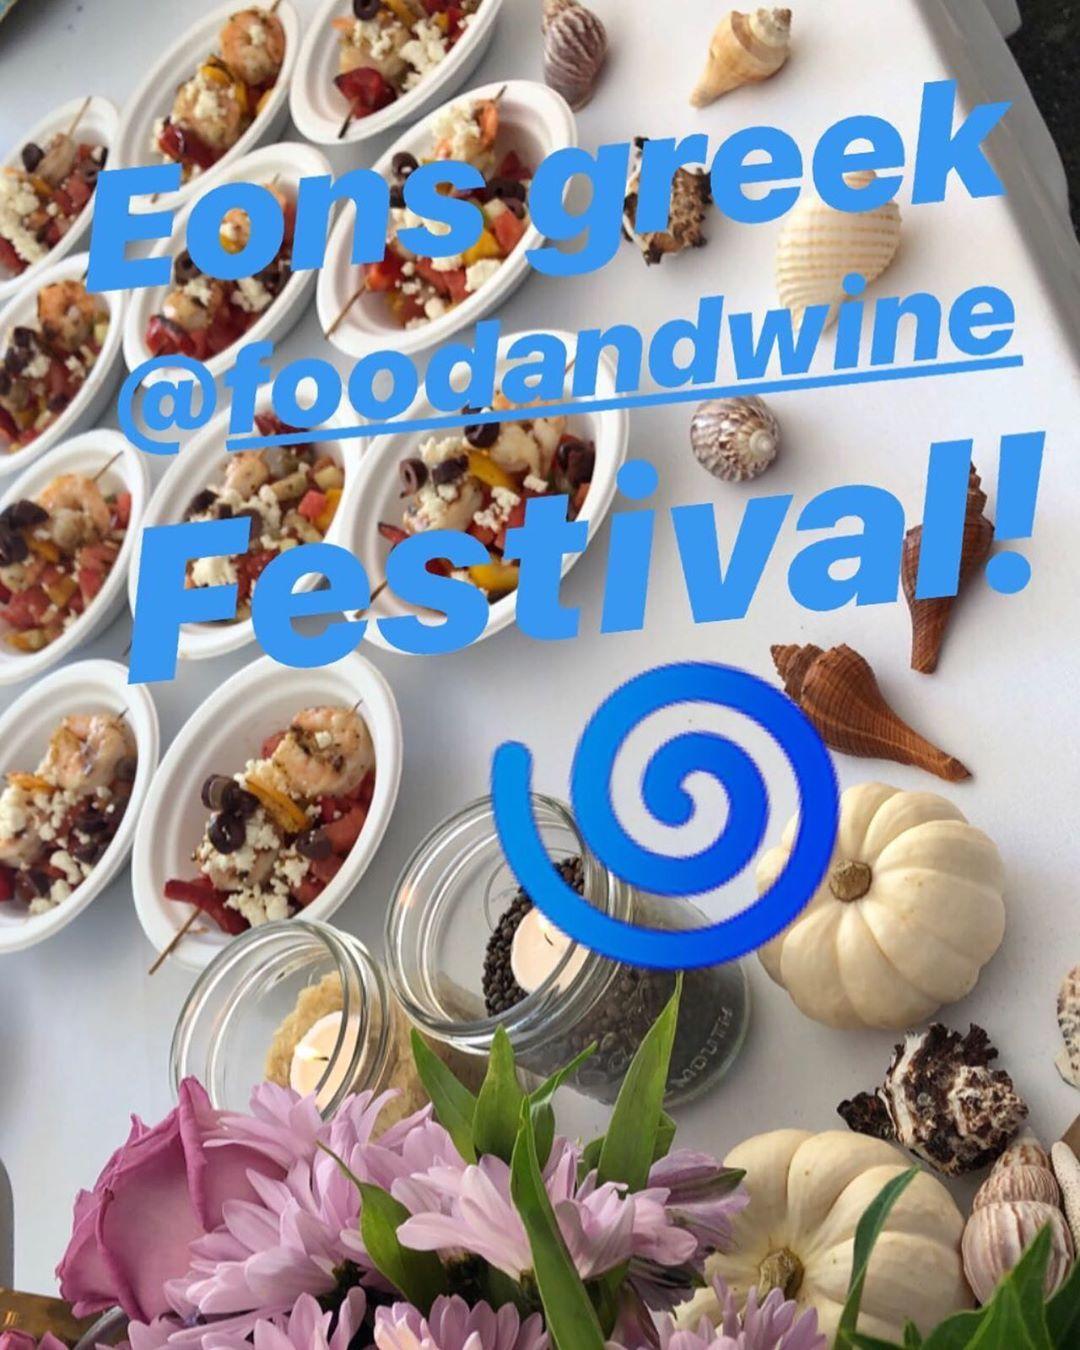 Delish Greek Goodness at the Food & Wine Festival🍷🌀🍷🌀 @eonsgreek